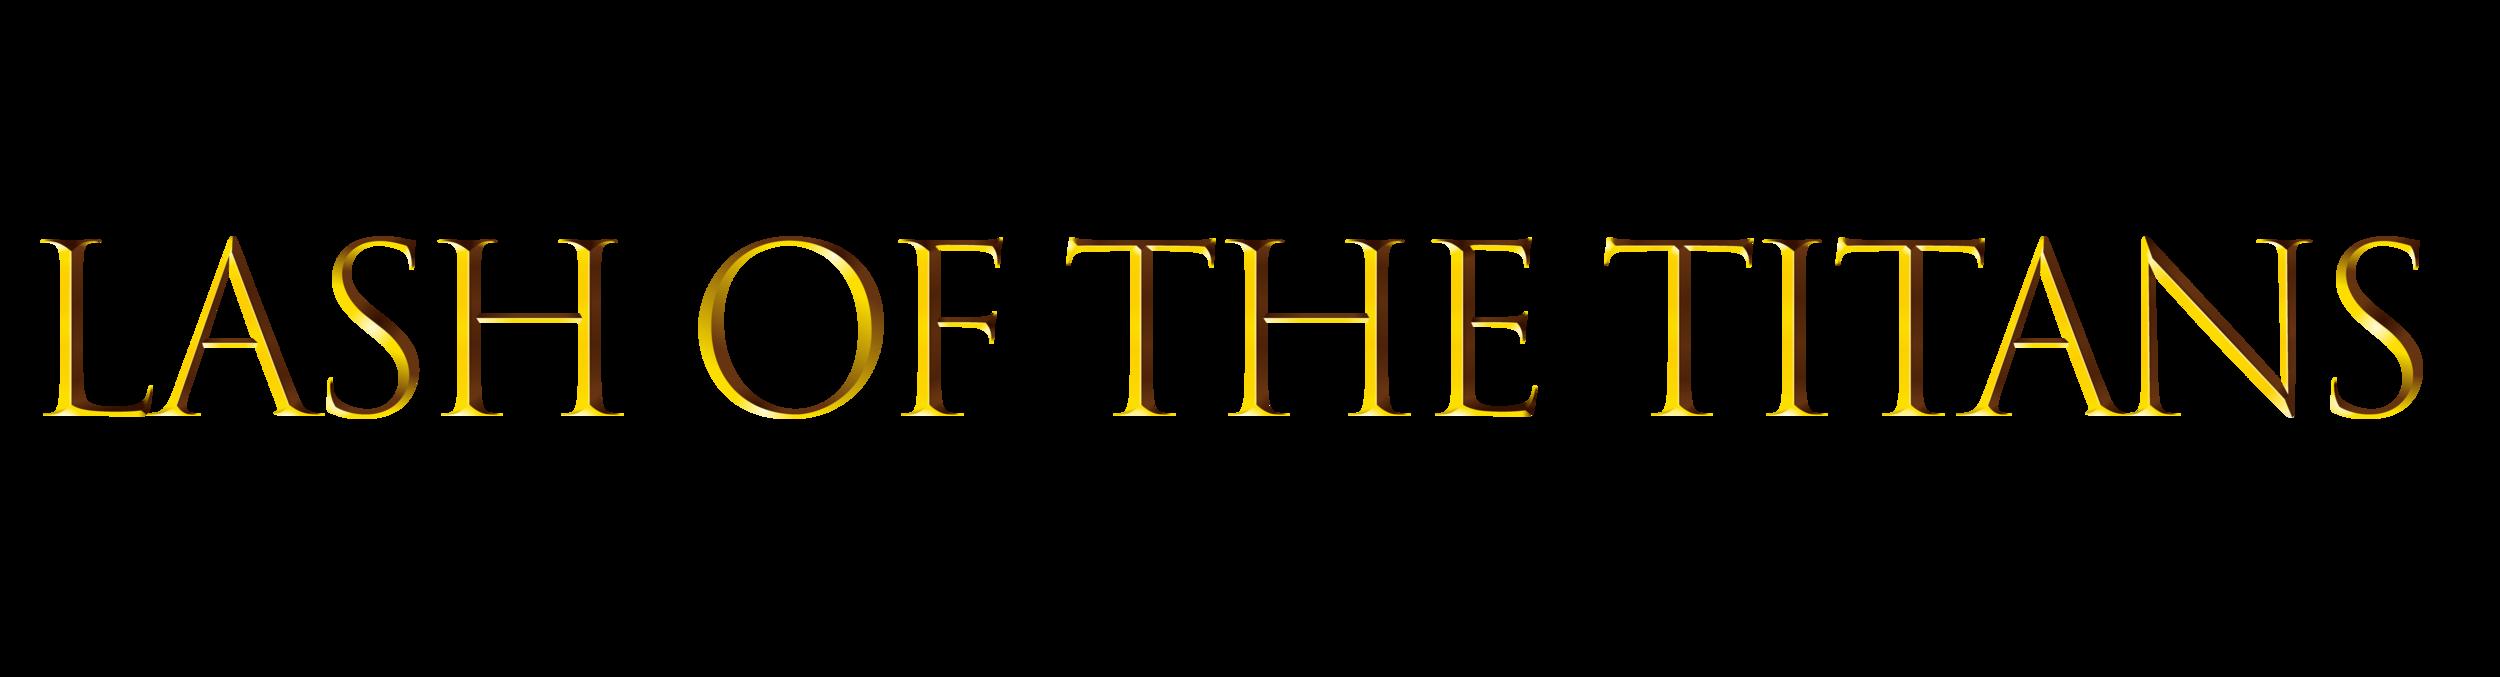 Lash of the Titan-10.png